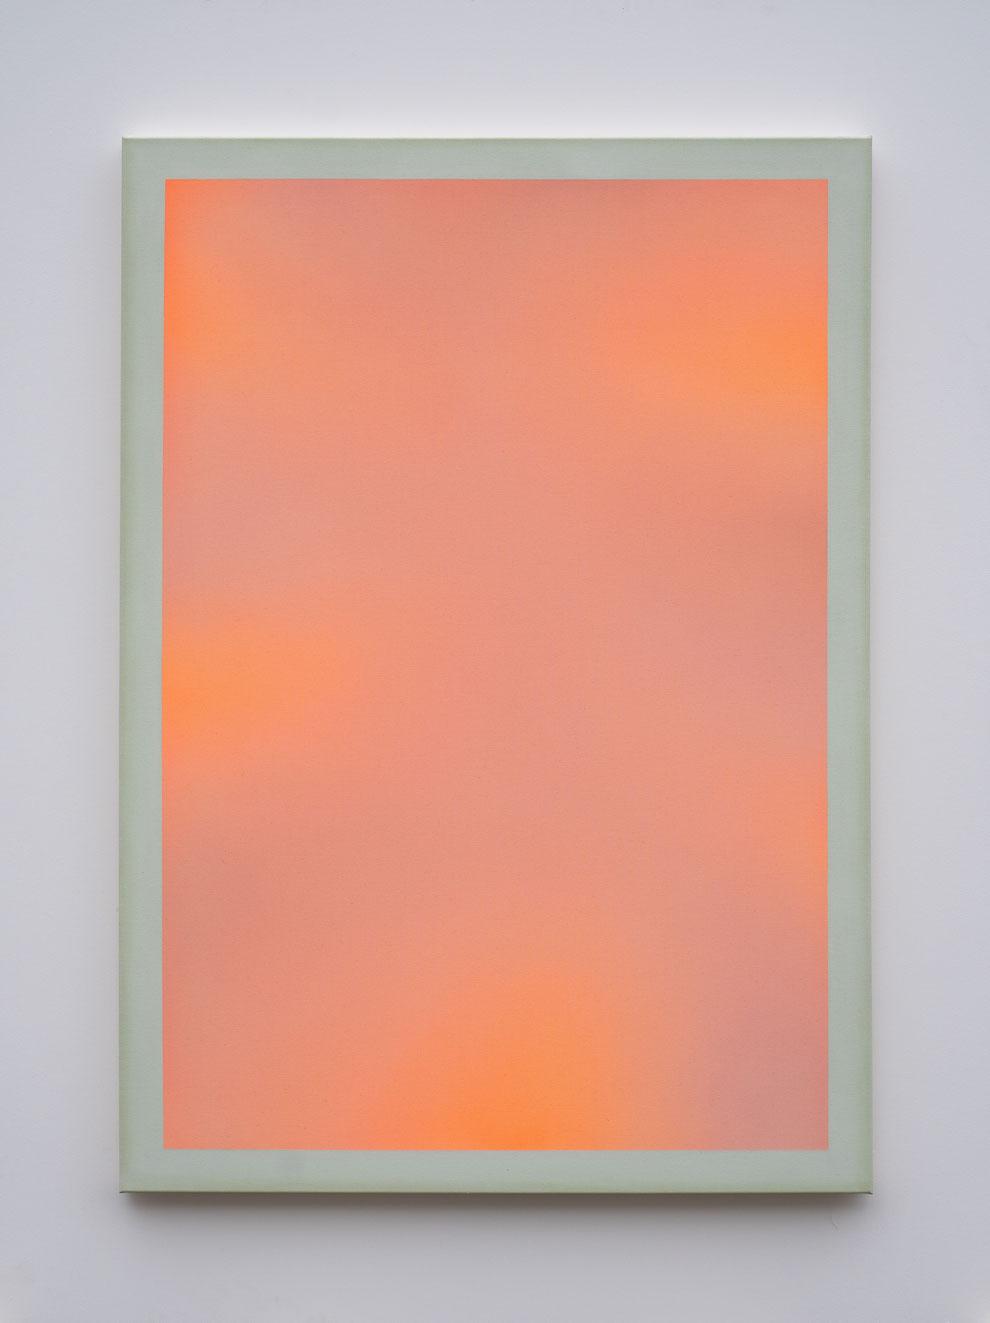 "Alina Birkner ""Untitled (Orange and Green)"" 2021, 170x120 cm"